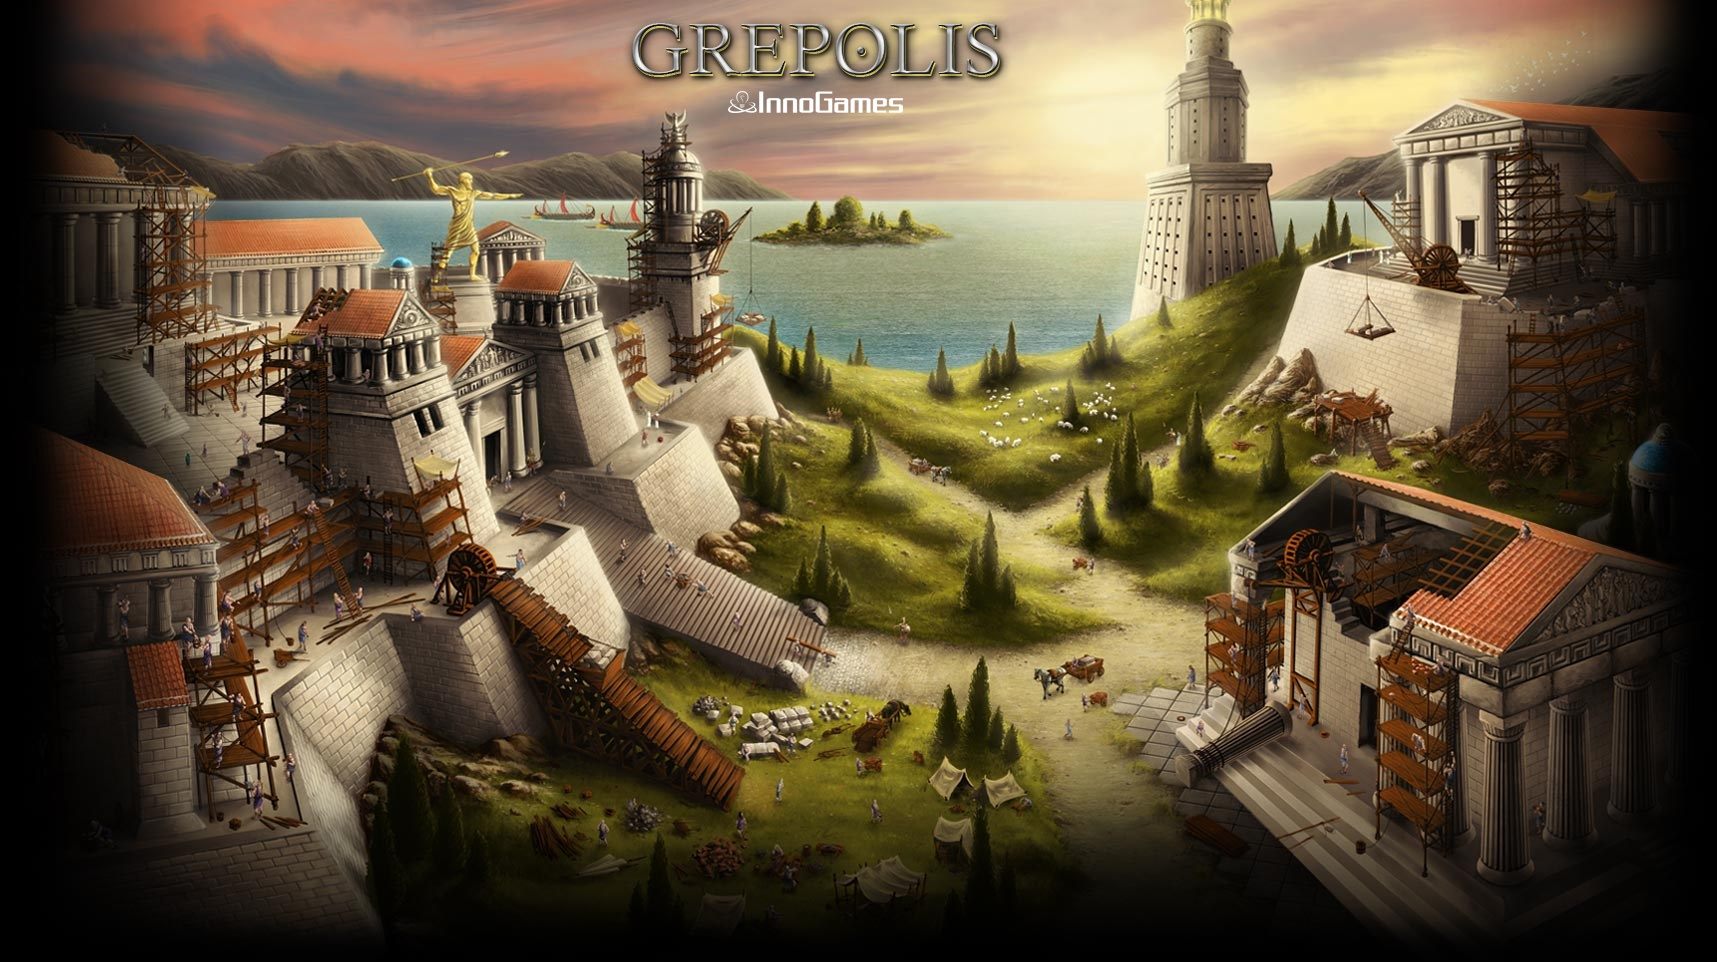 Grepolis wallpapers   Grepolis 1717x962